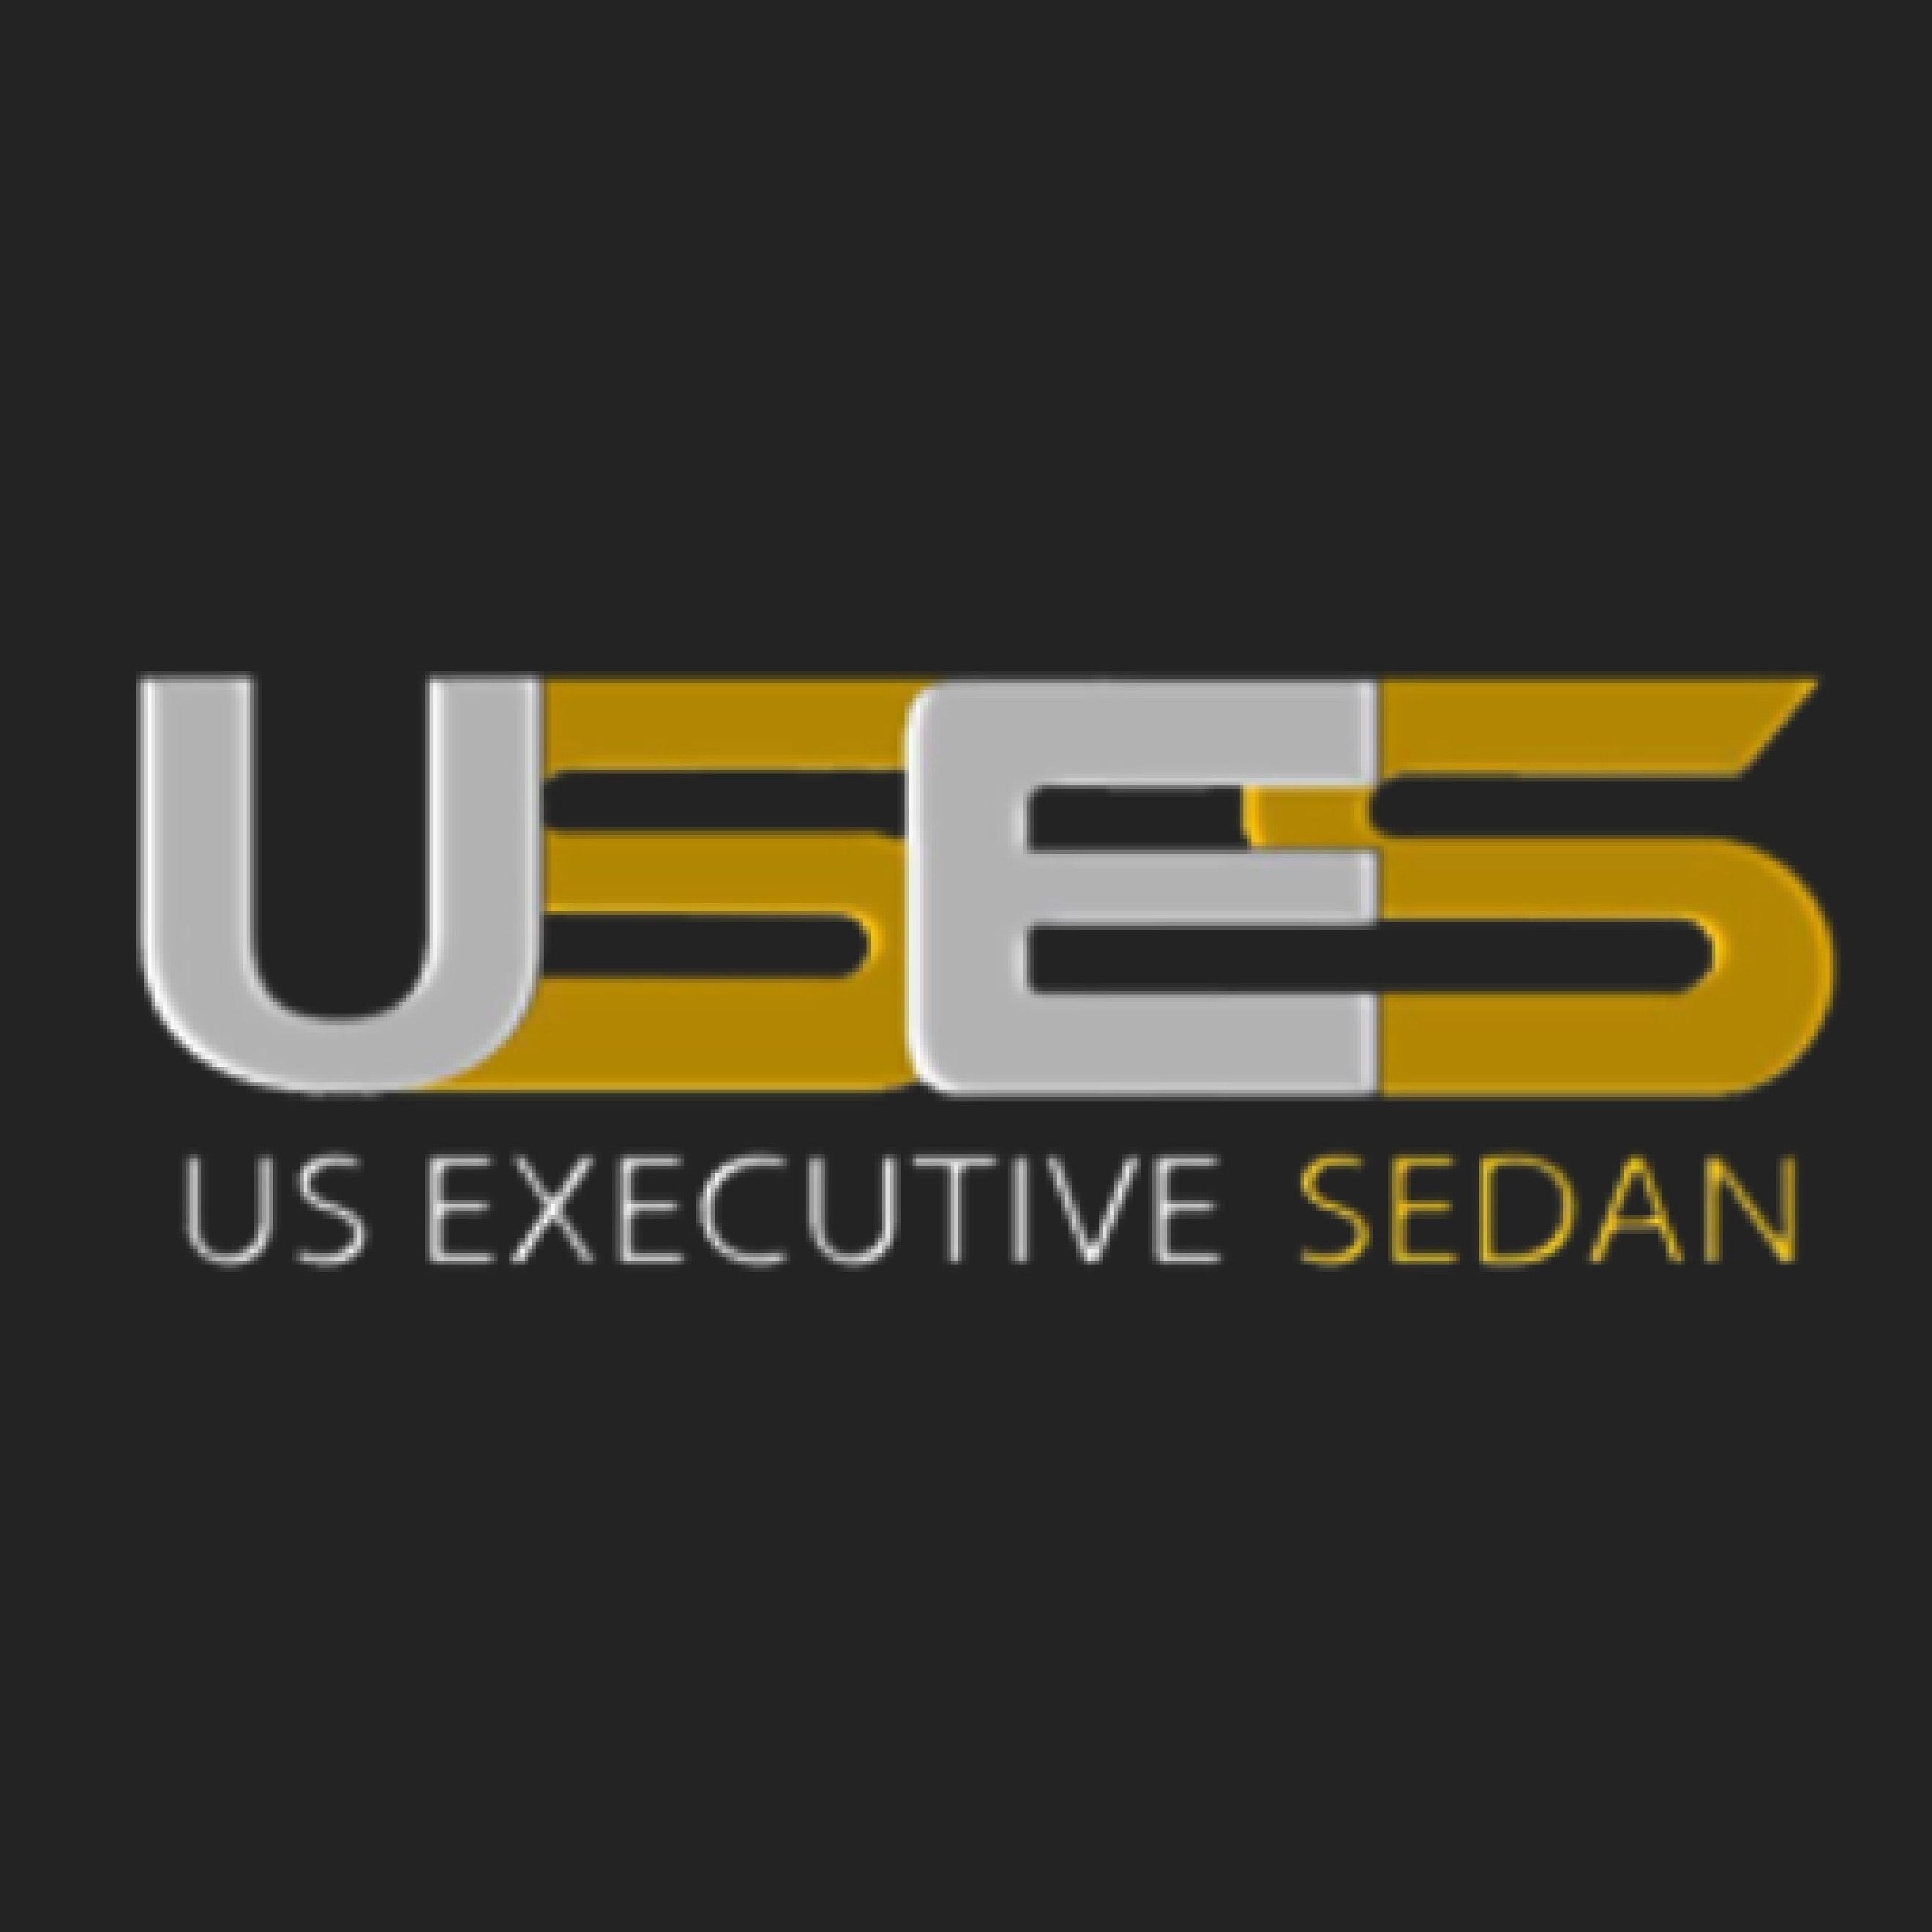 US Executive Sedan logo